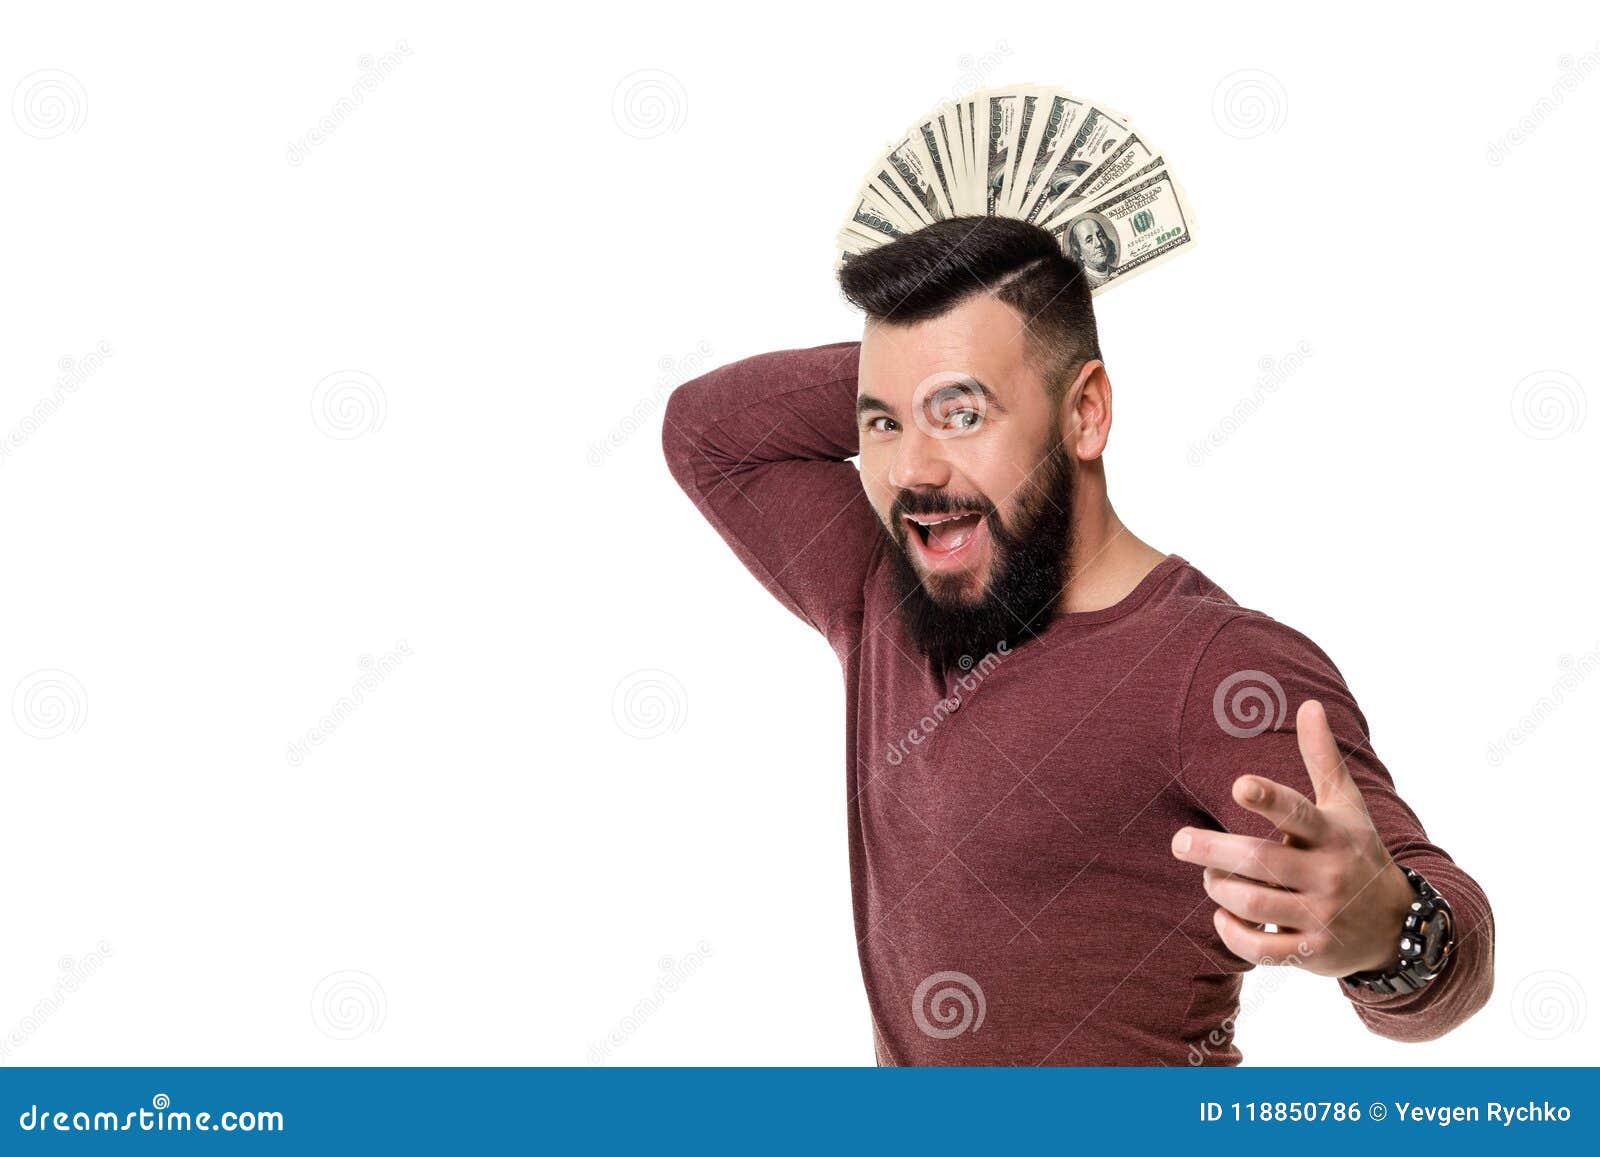 Man with beard holding money